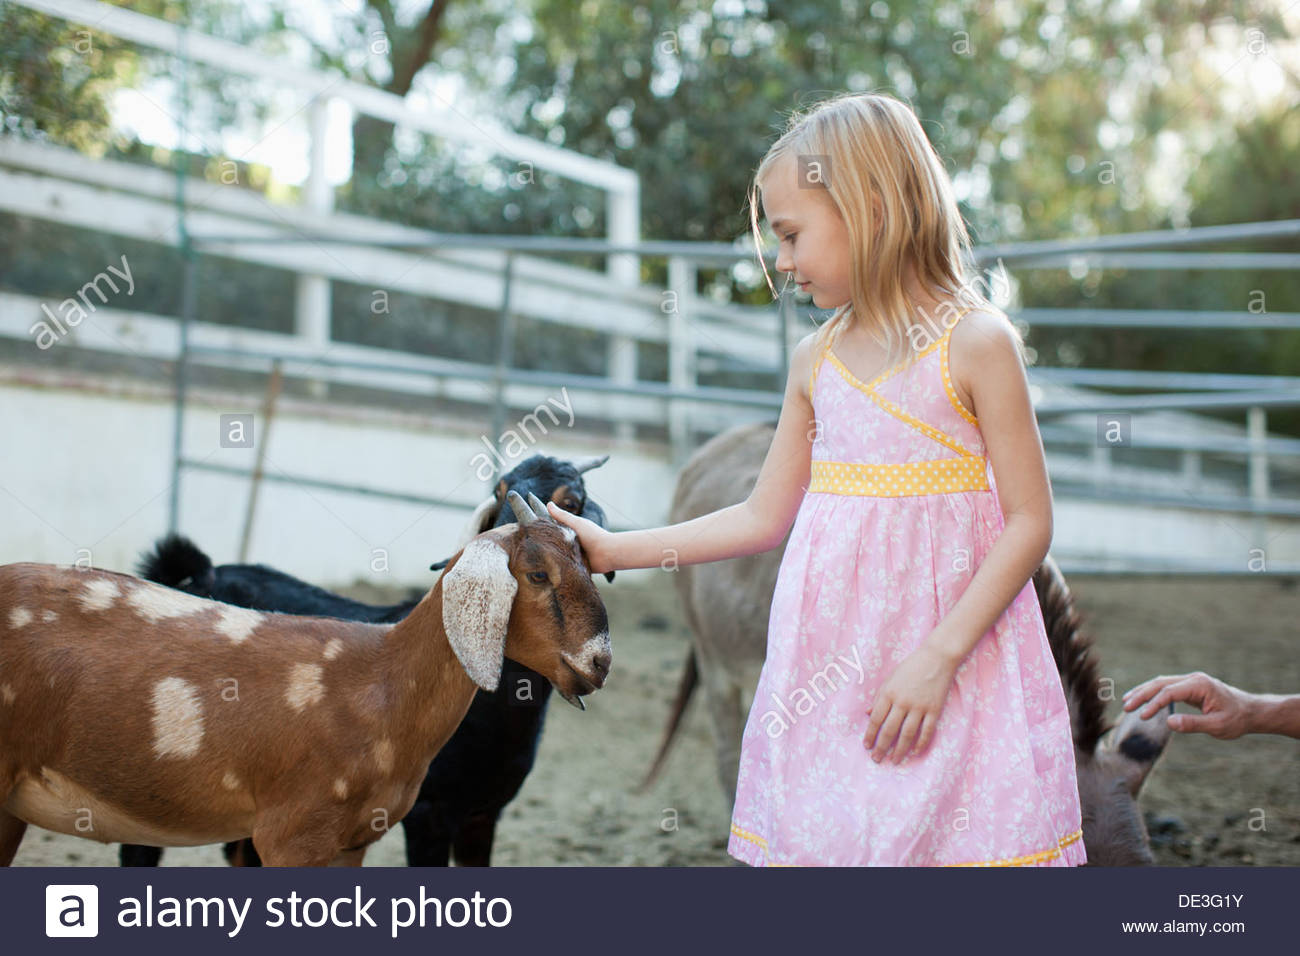 Mädchen Petting Ziege Stockbild